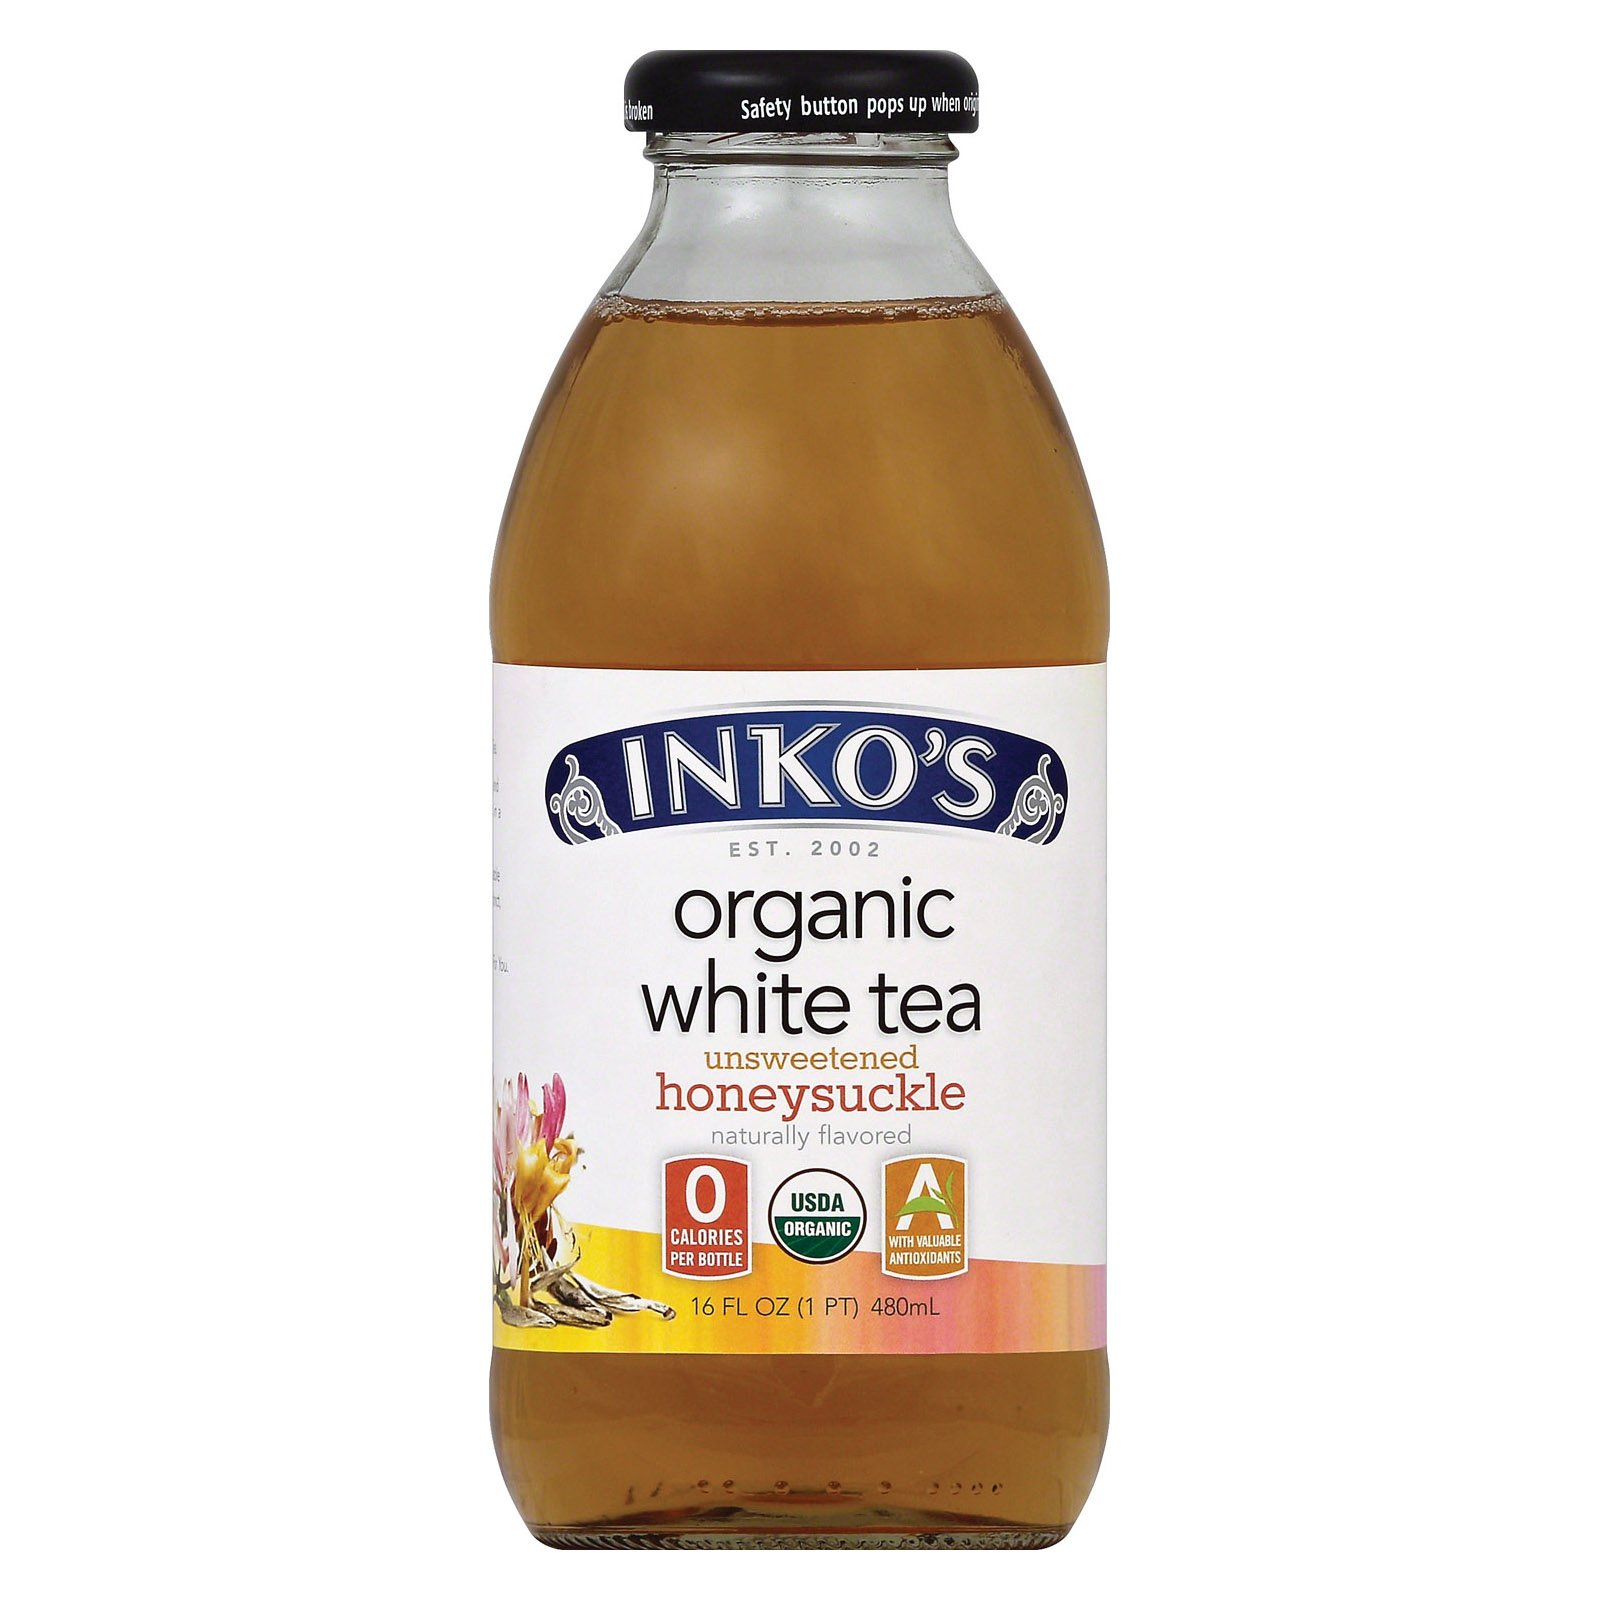 Inko's White Organic White Tea - Unsweetened Honeysuckle - Case of 12-16 Fl oz.